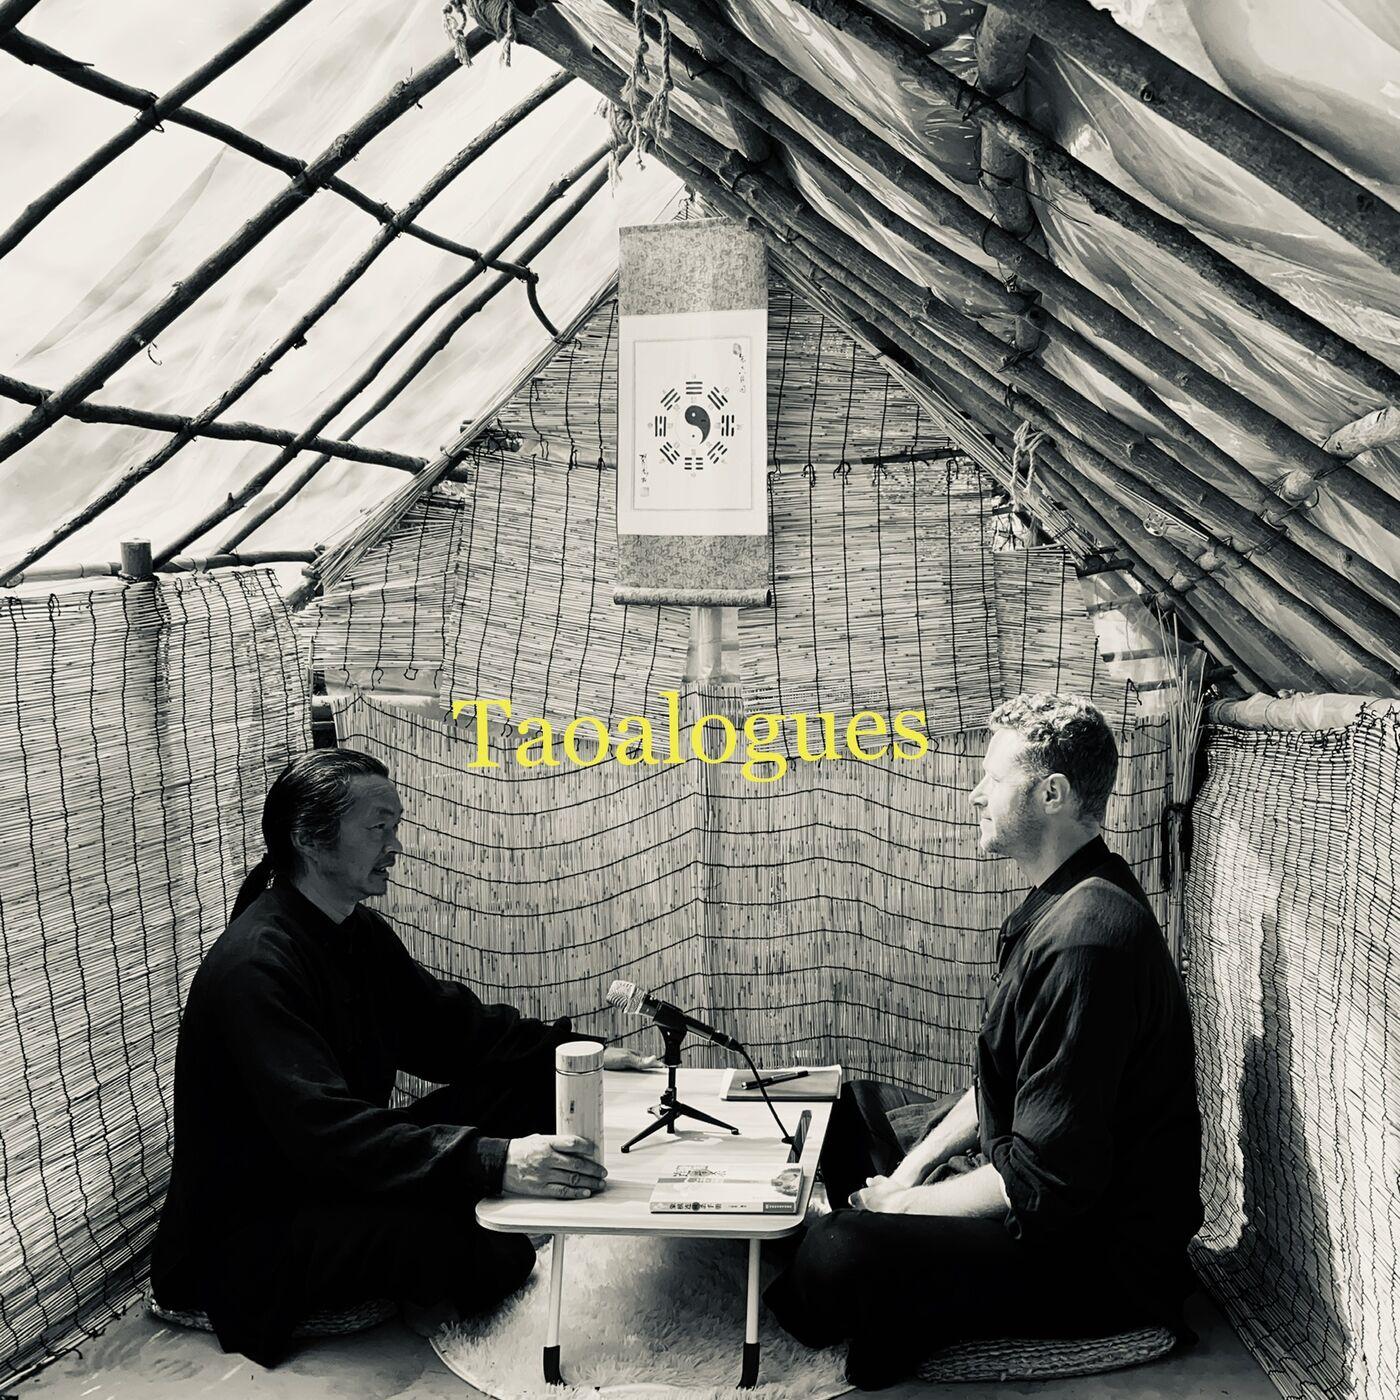 Taoalogues